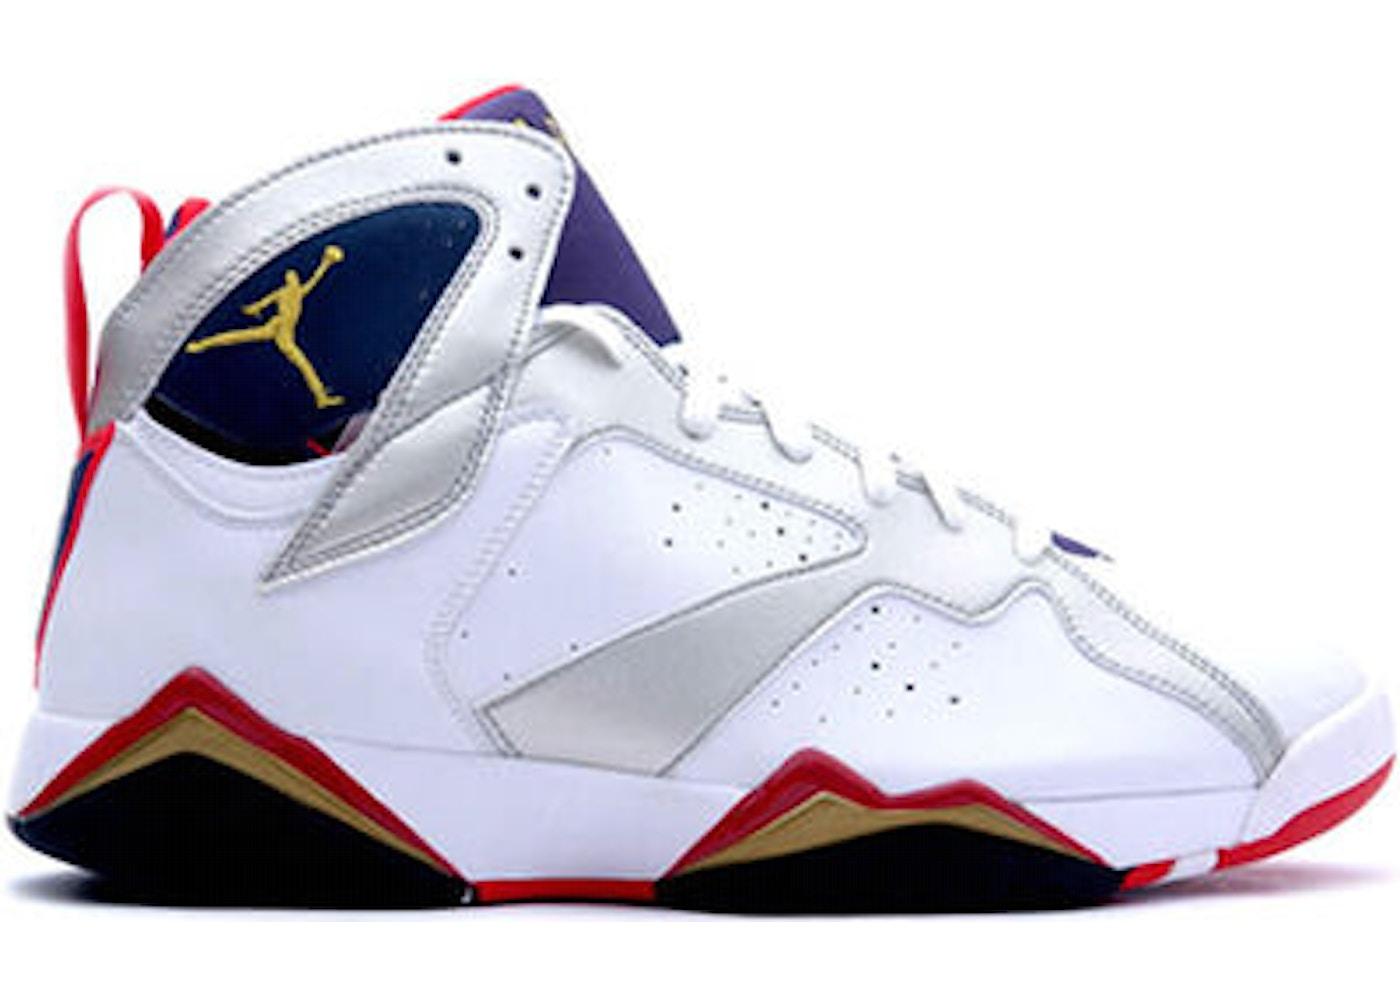 6ecf9153d0f60f Jordan 7 OG Olympic (1992) - 130157-110